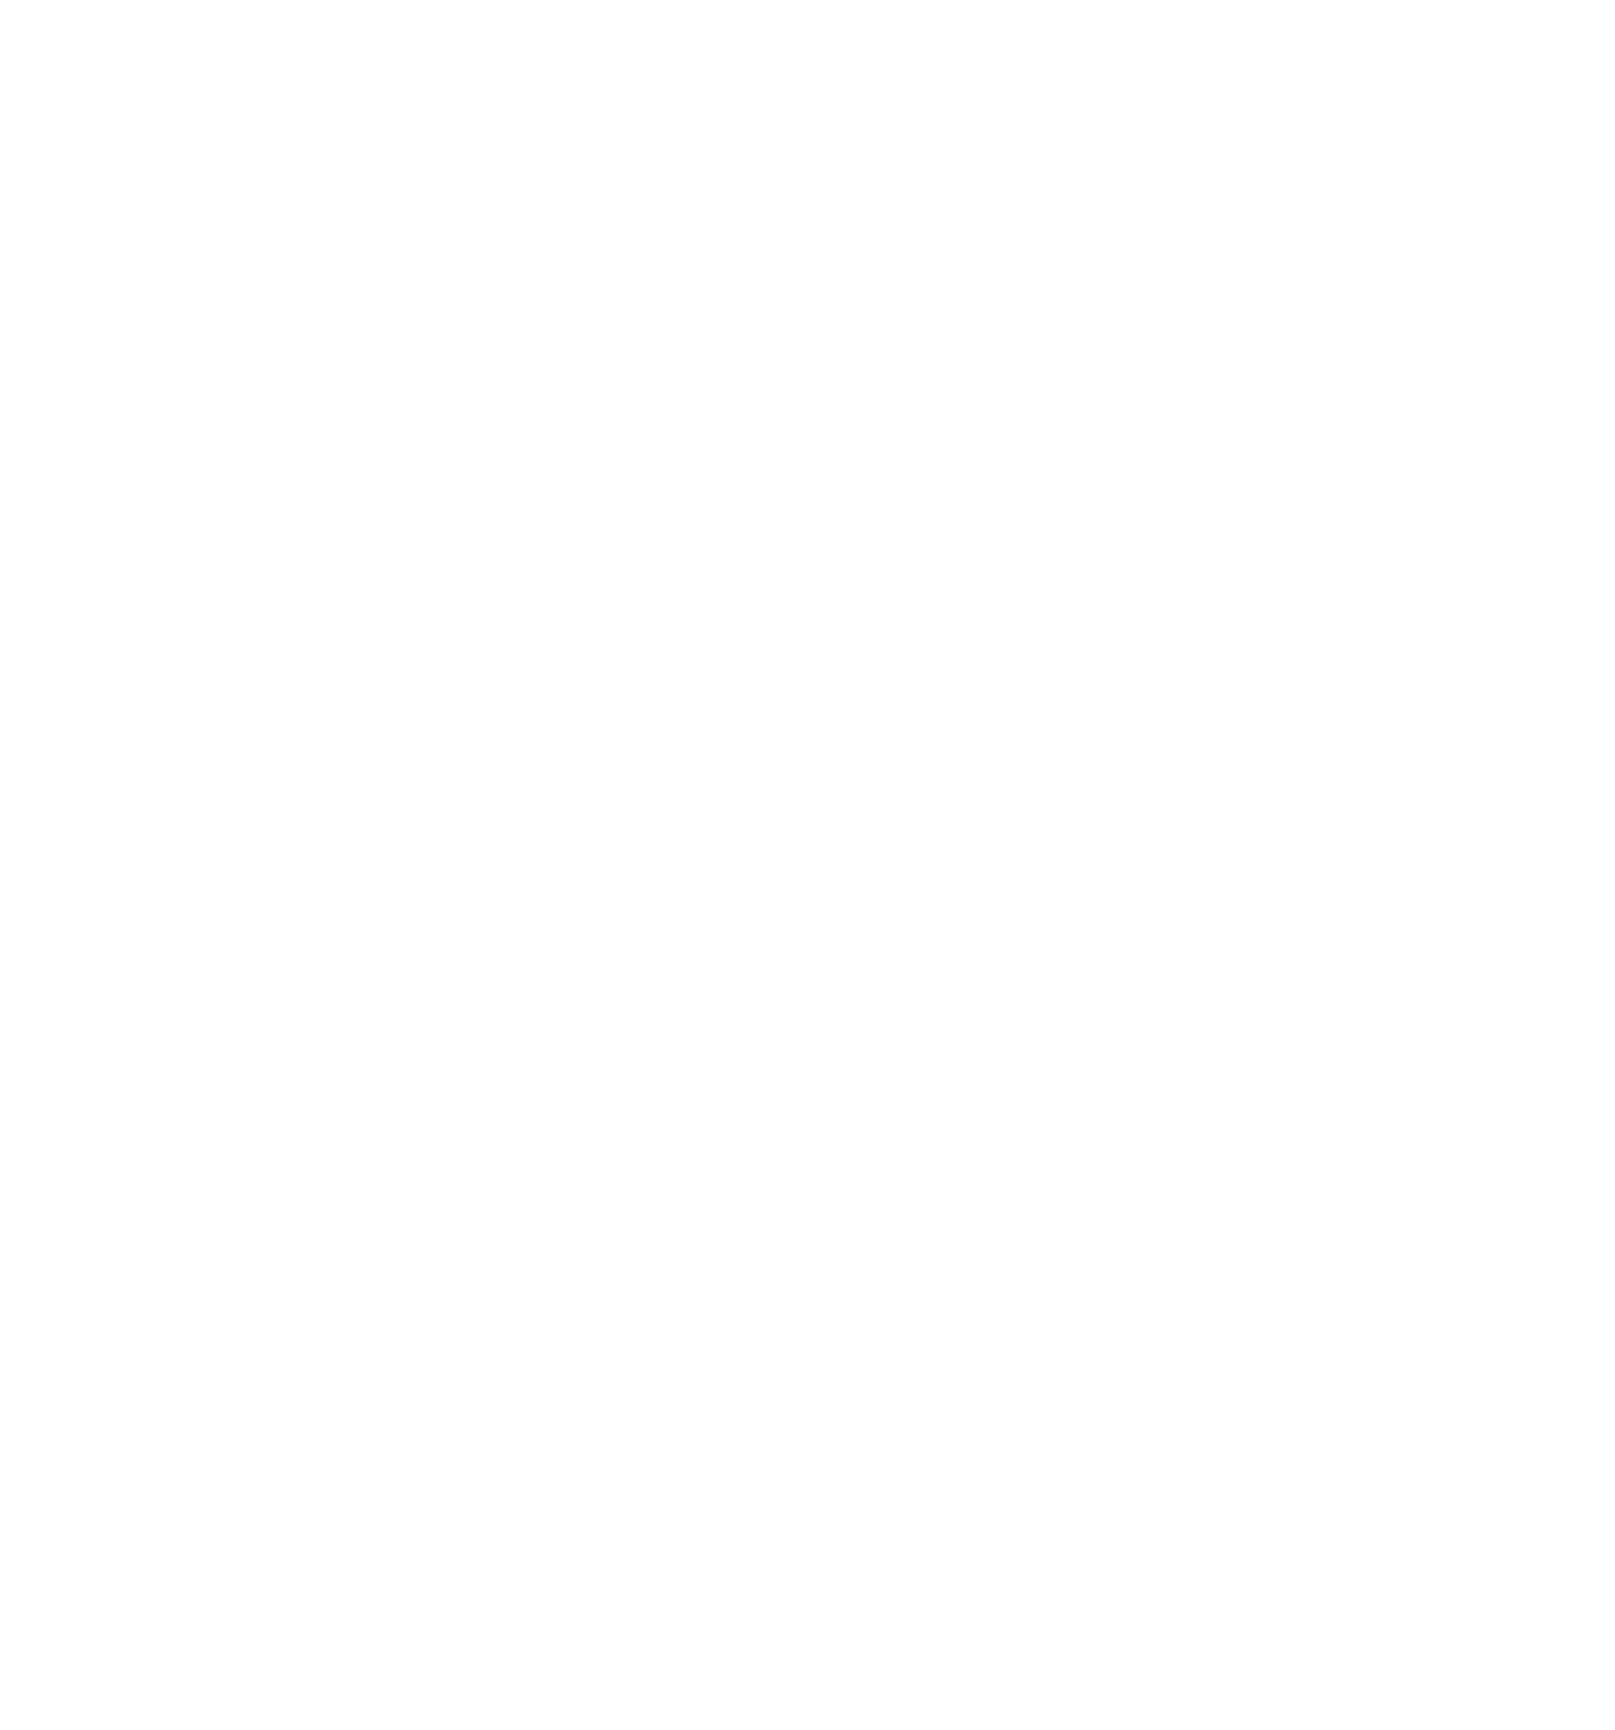 logo AfkariDigital Putih PNG icon tranparant-02